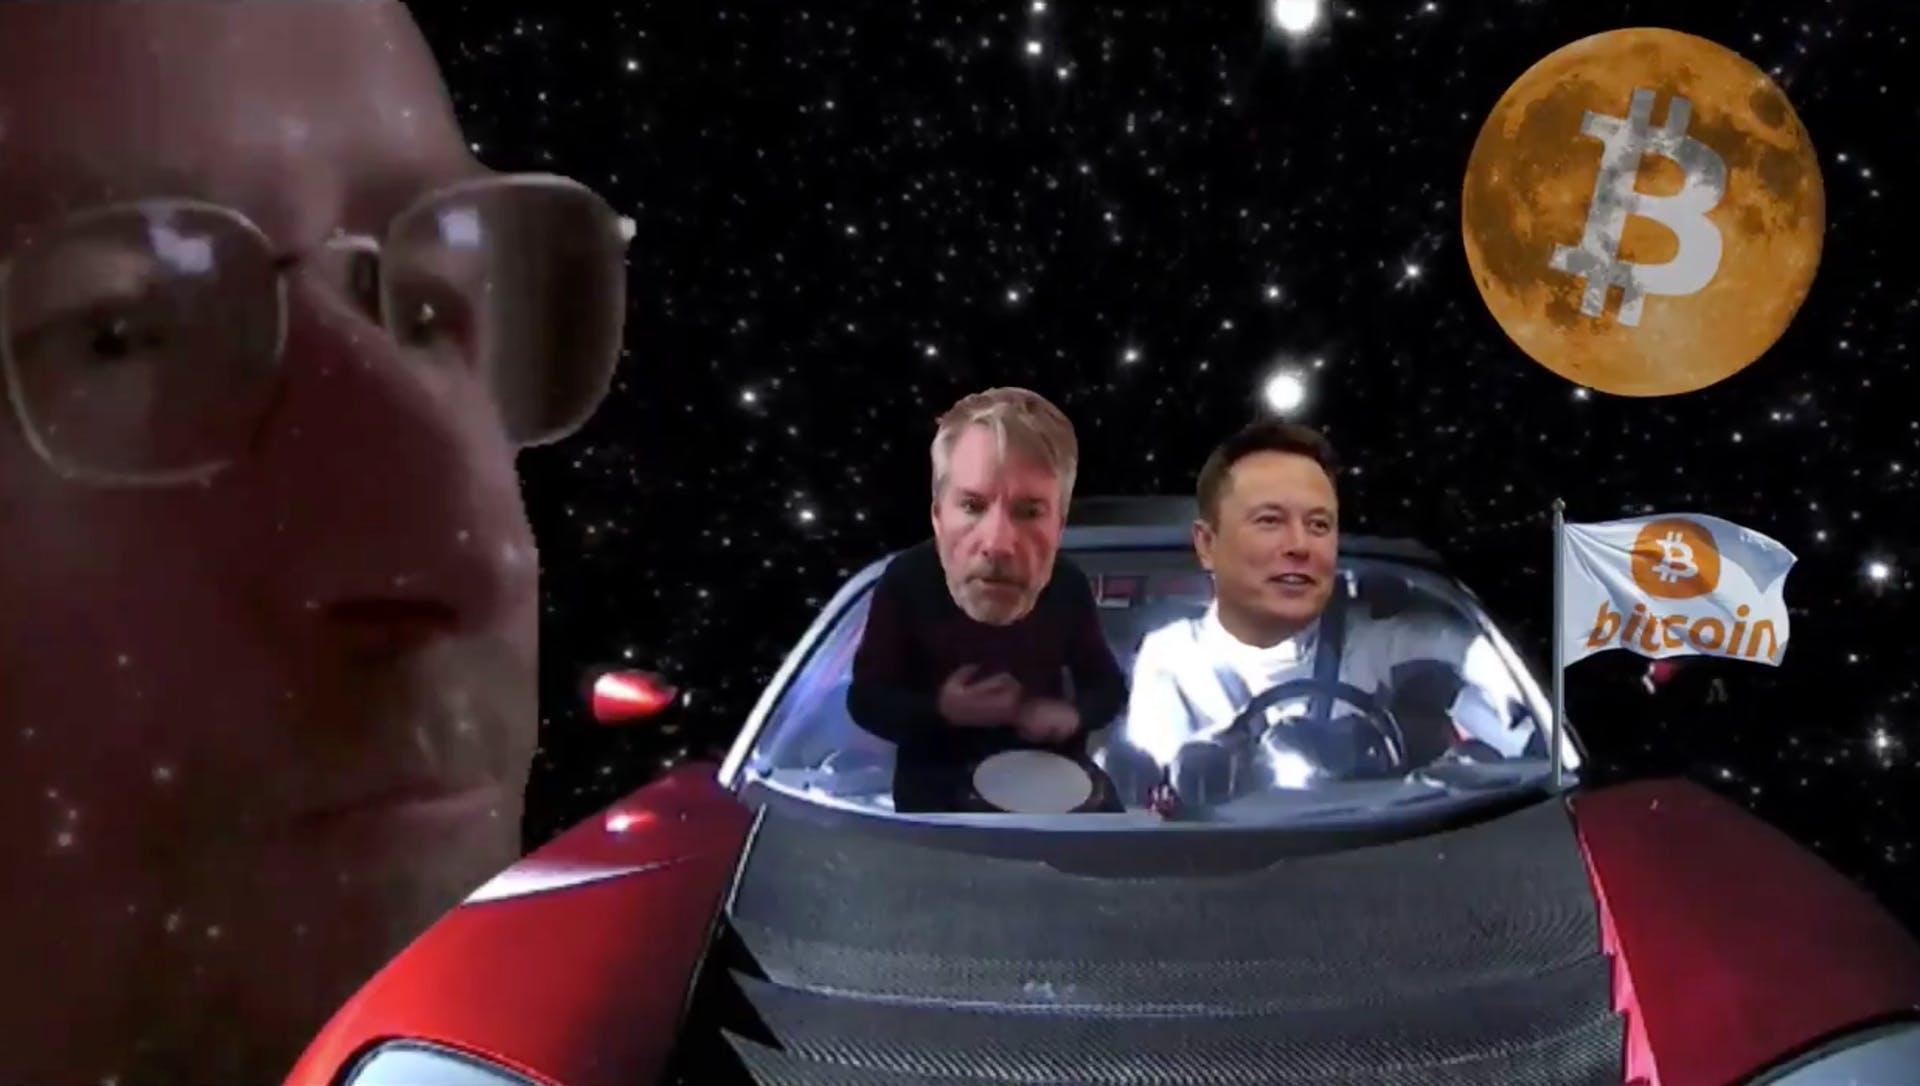 Elon & Saylor